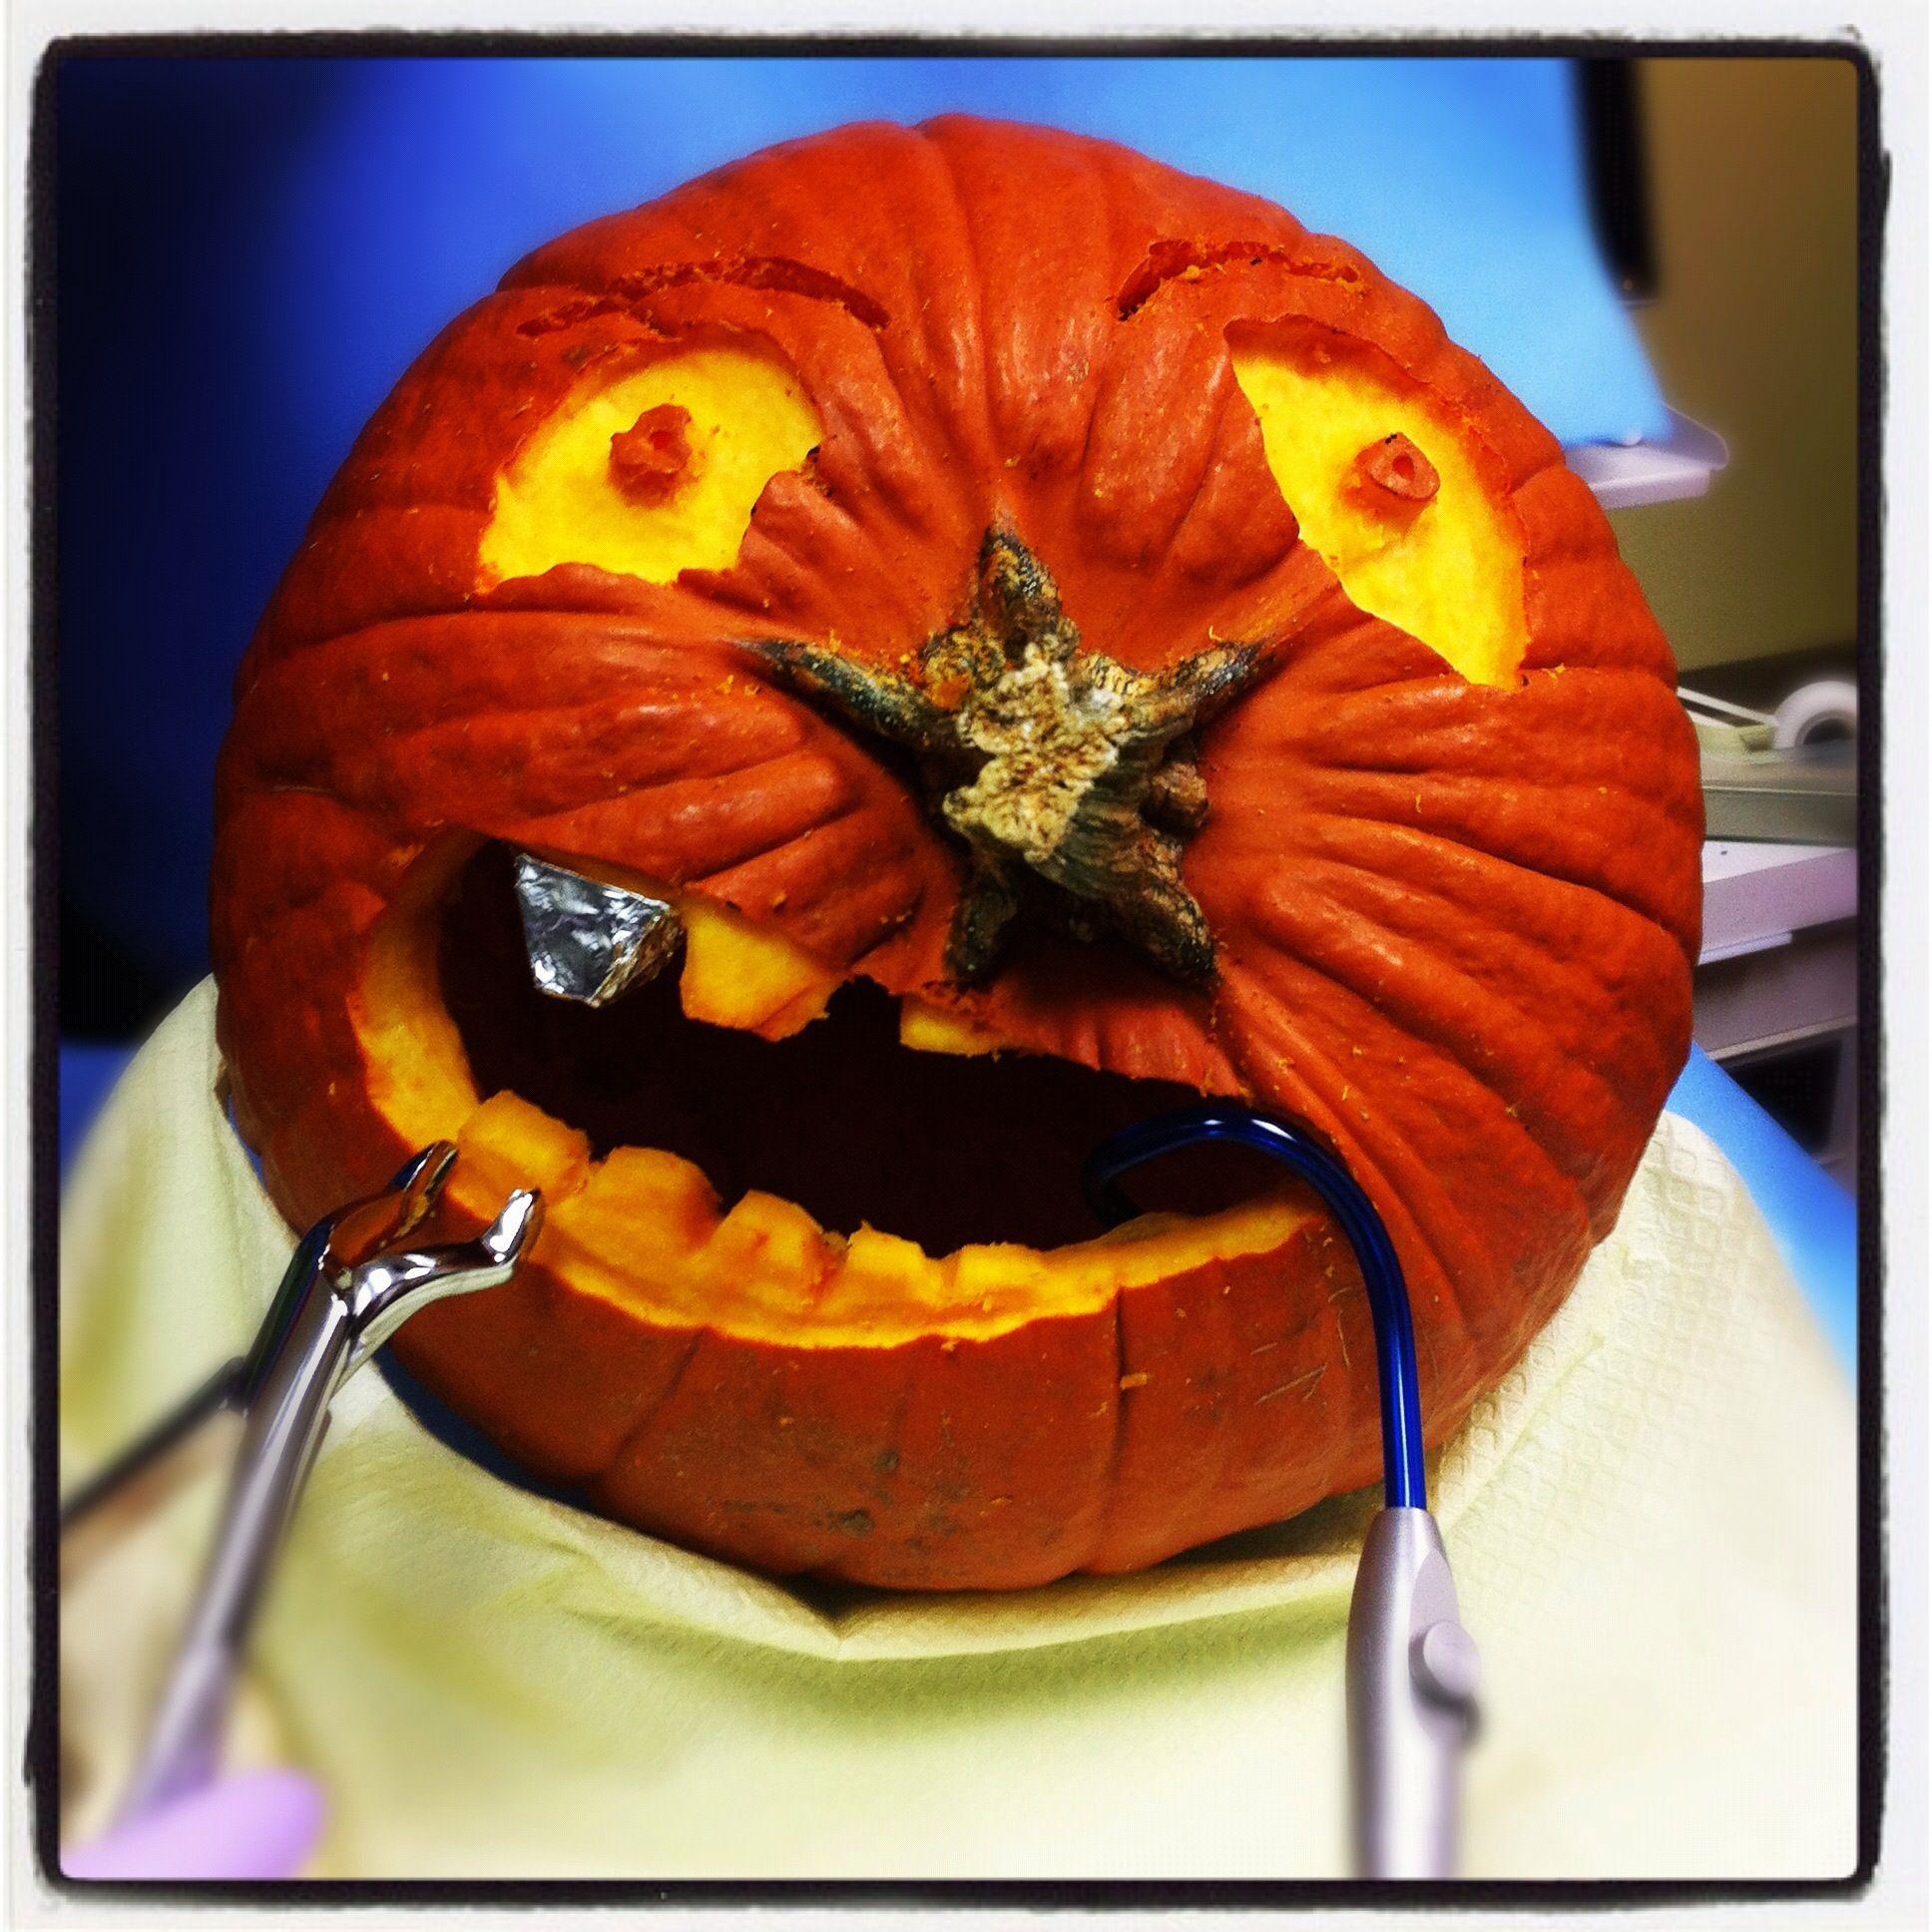 do you feel sorry for dental pumpkins that need dental work so